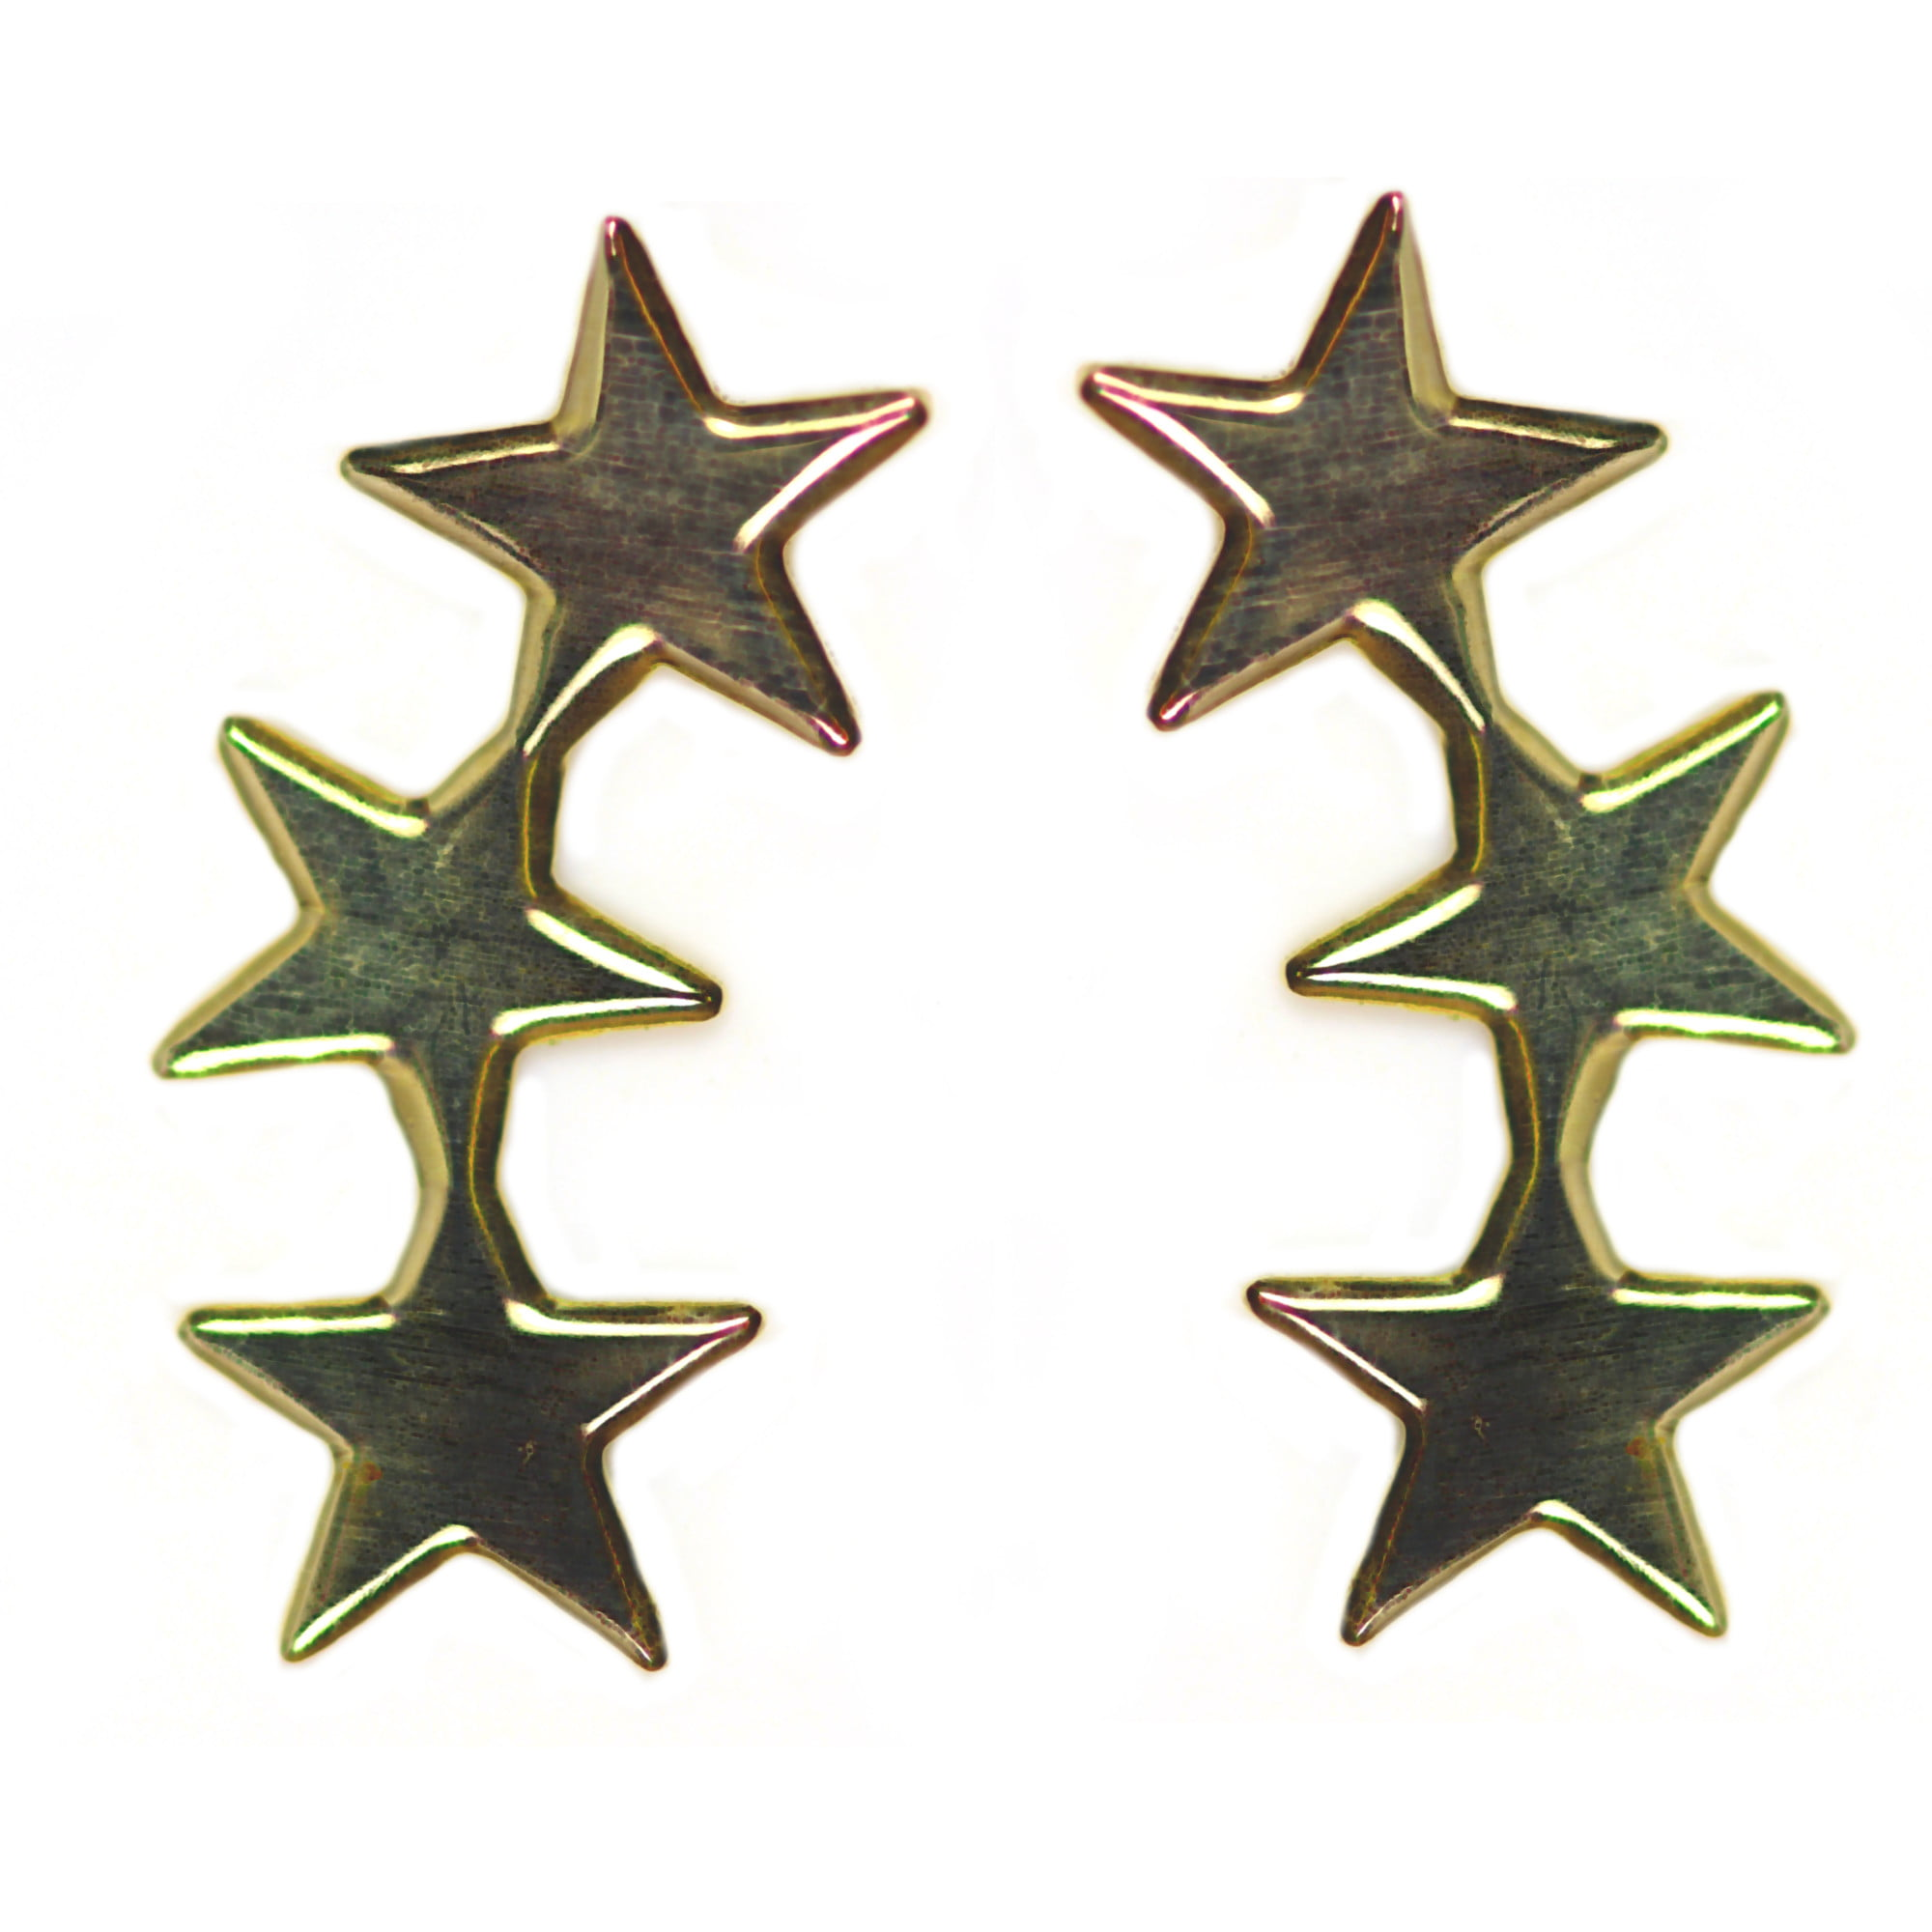 9ct gold cascading star earrings